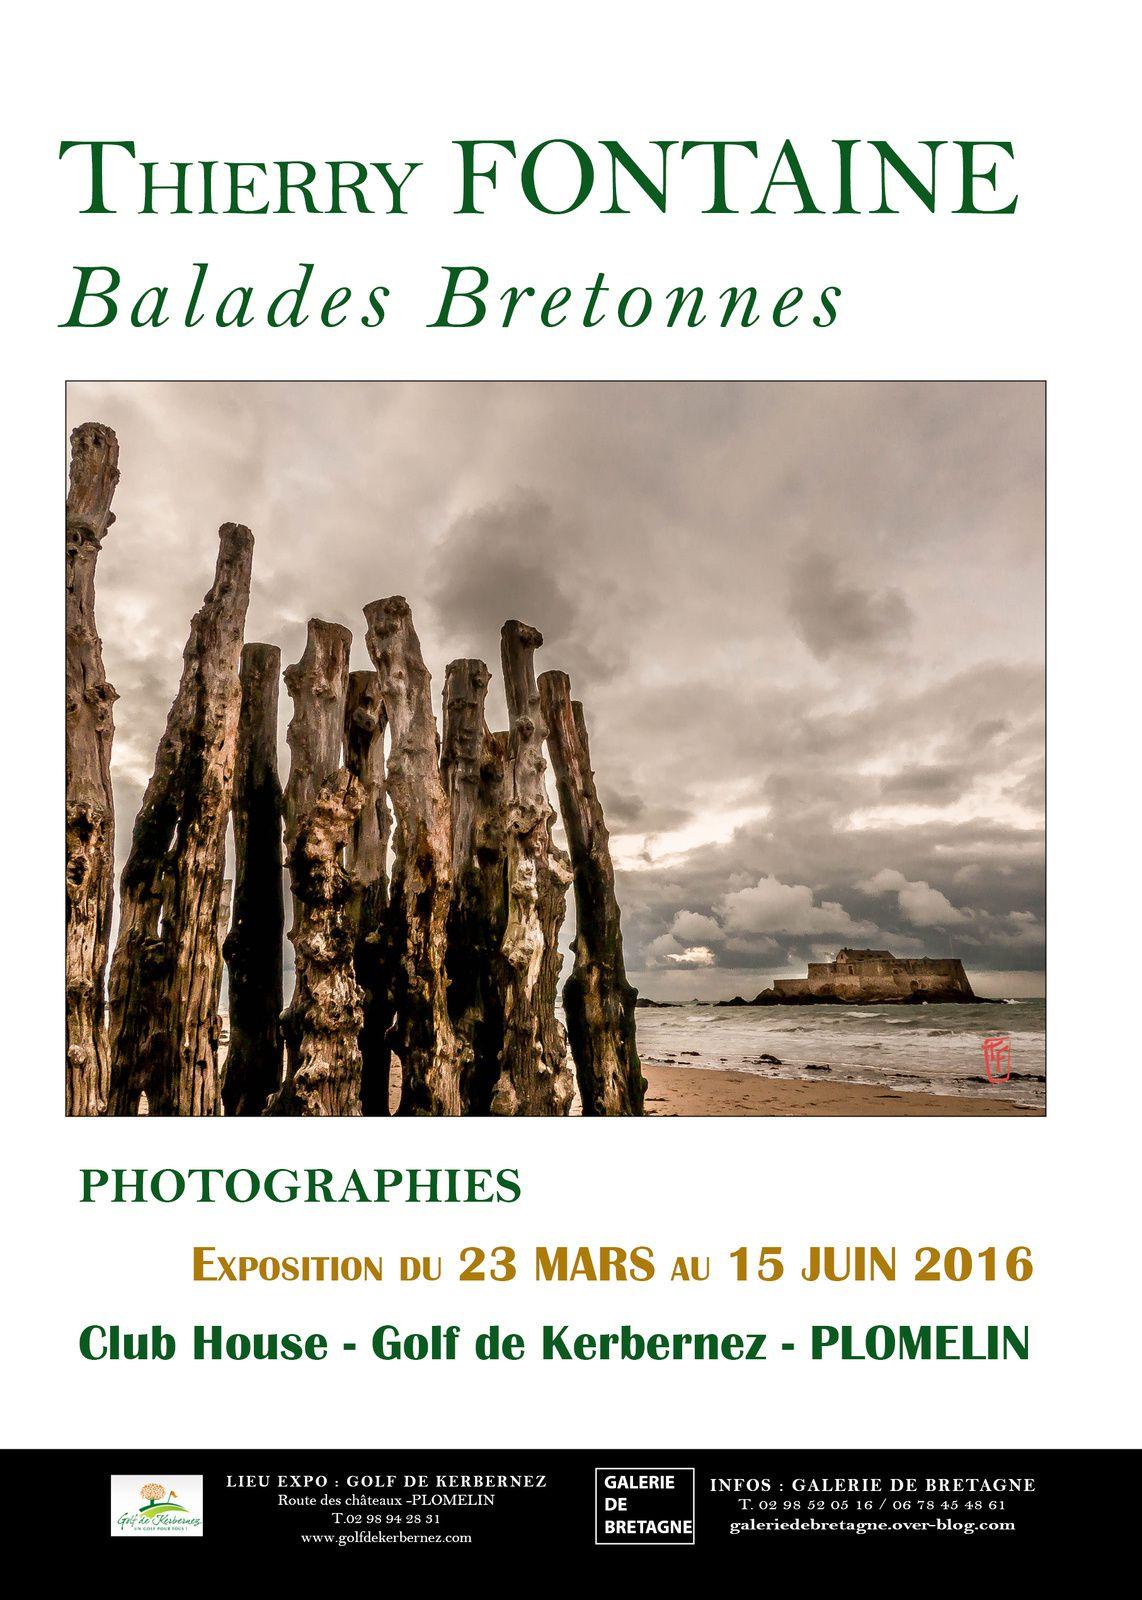 Balades Bretonnes de Thierry Fontaine